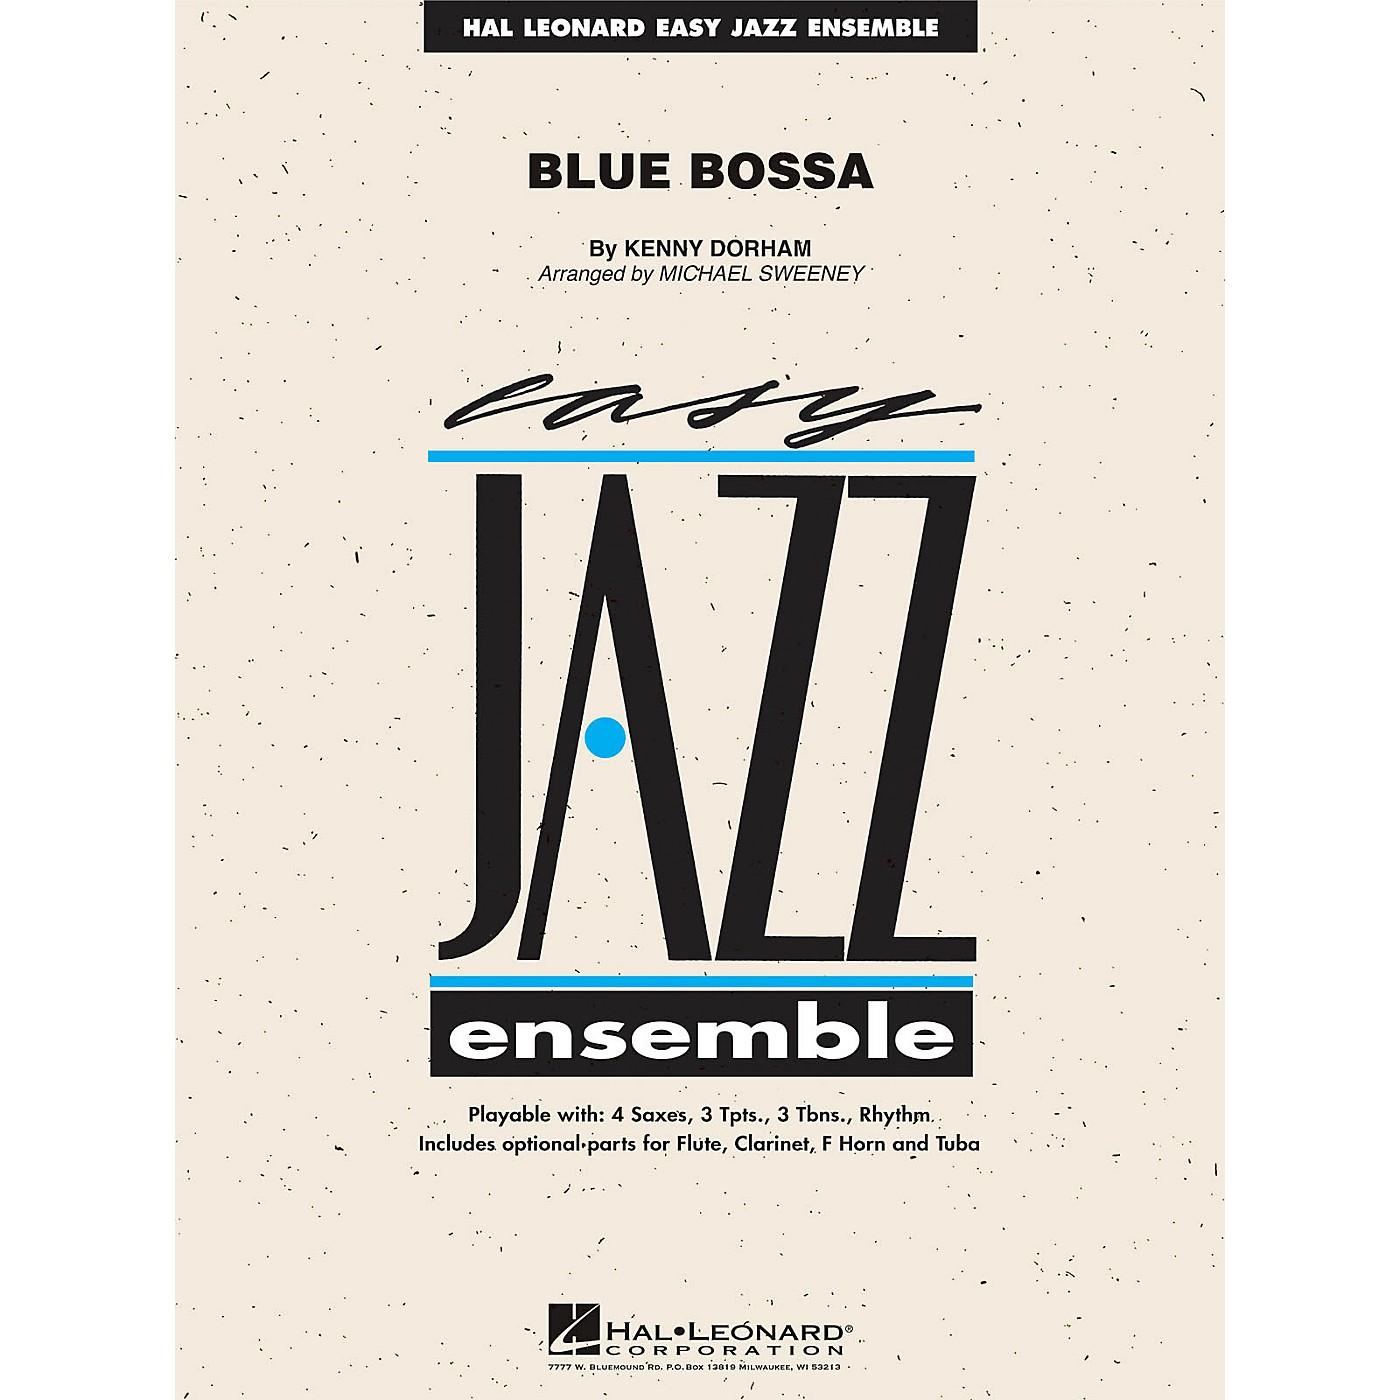 Hal Leonard Blue Bossa Jazz Band Level 2 Arranged by Michael Sweeney thumbnail